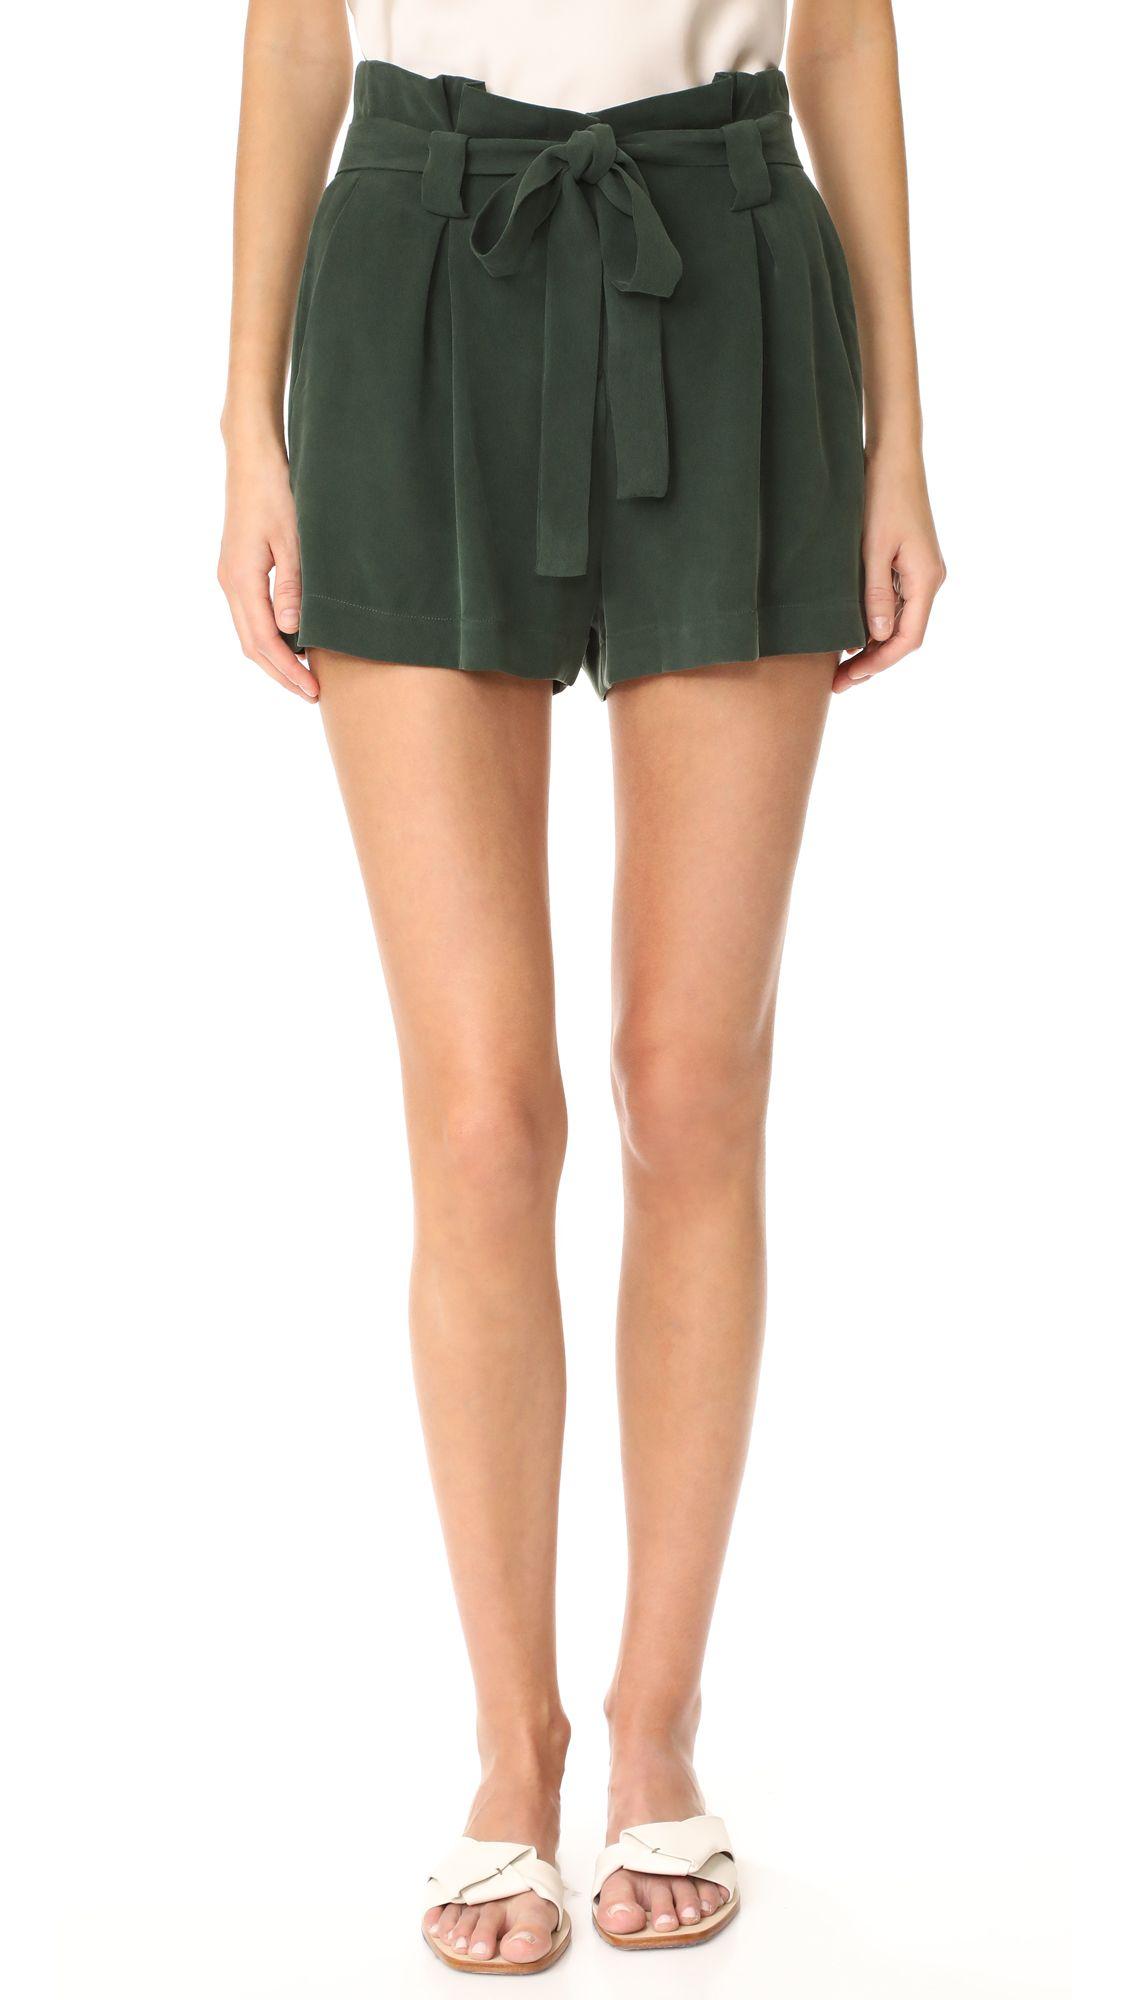 alex paper bag shorts | wear | pinterest | shorts, bag and clothes